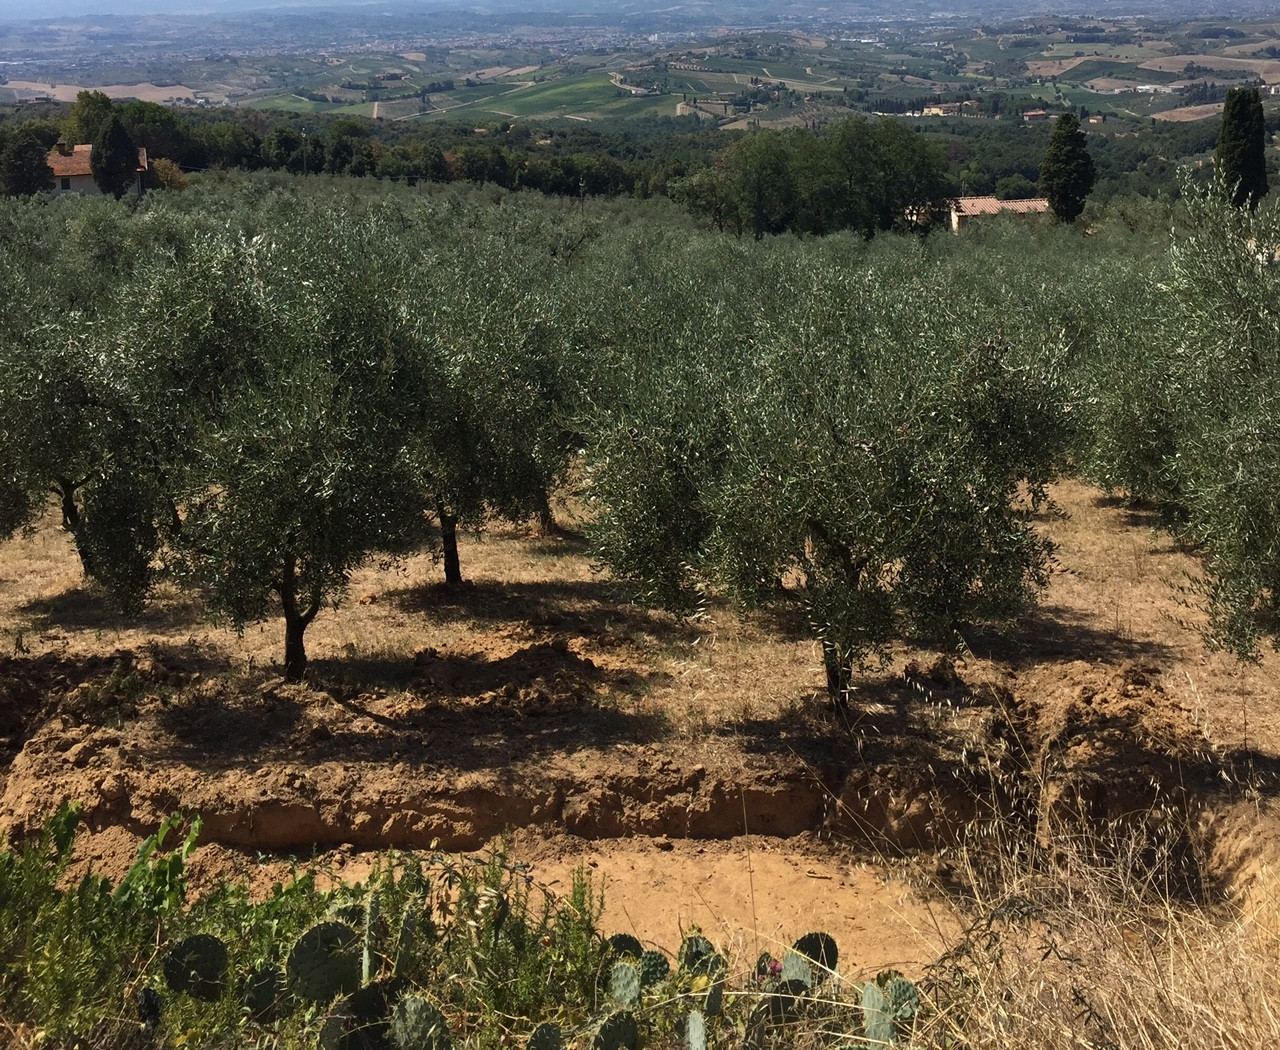 Cresce l'interesse per gli olivi